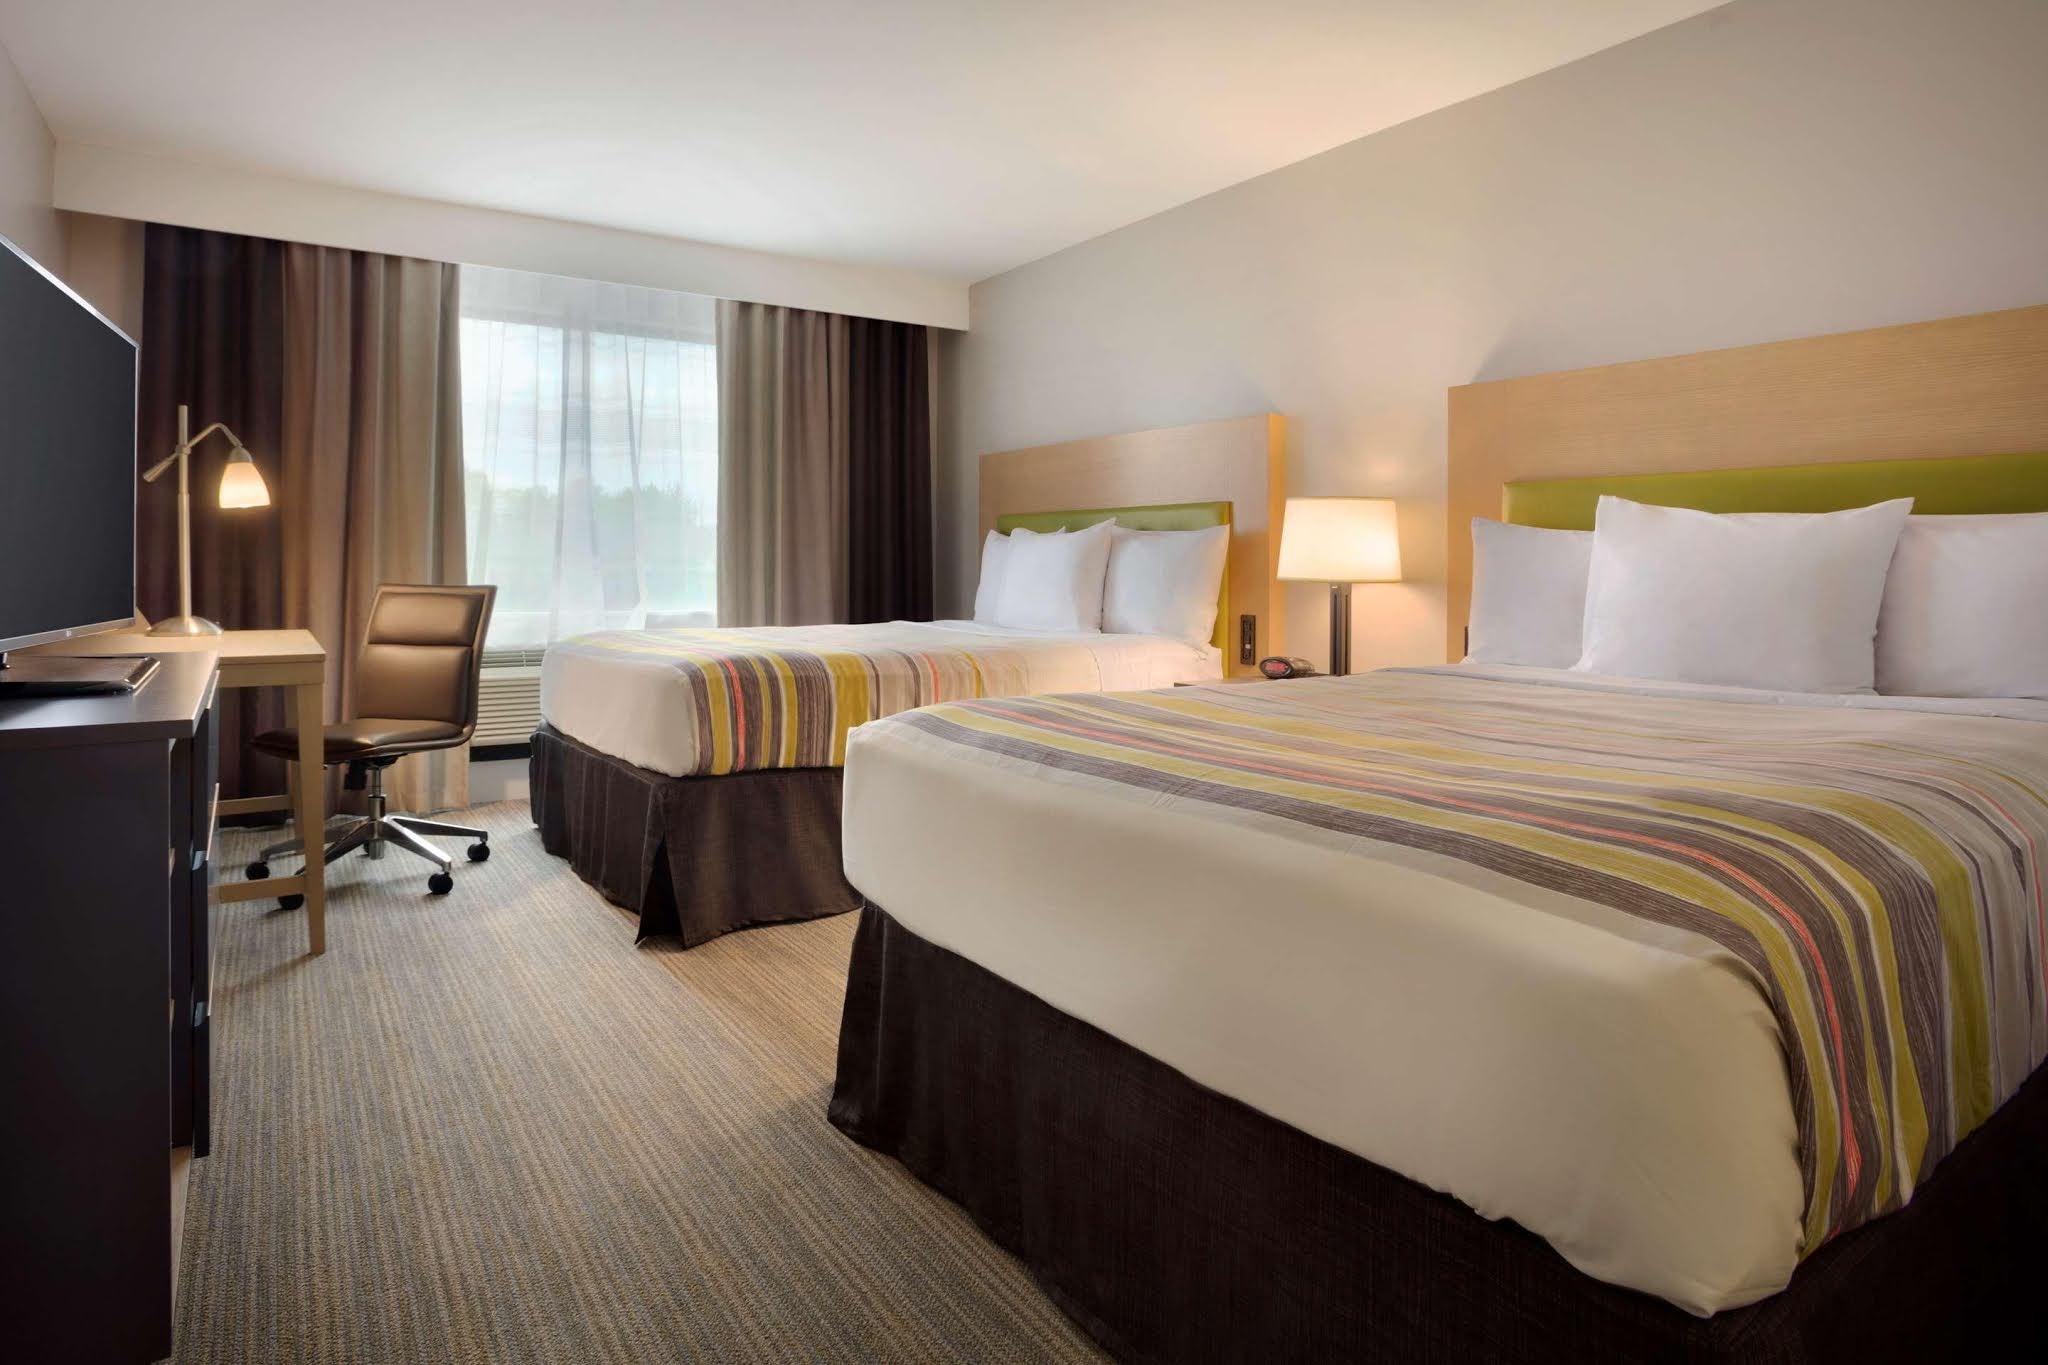 Best Hotel Address at Marina Ca, USA